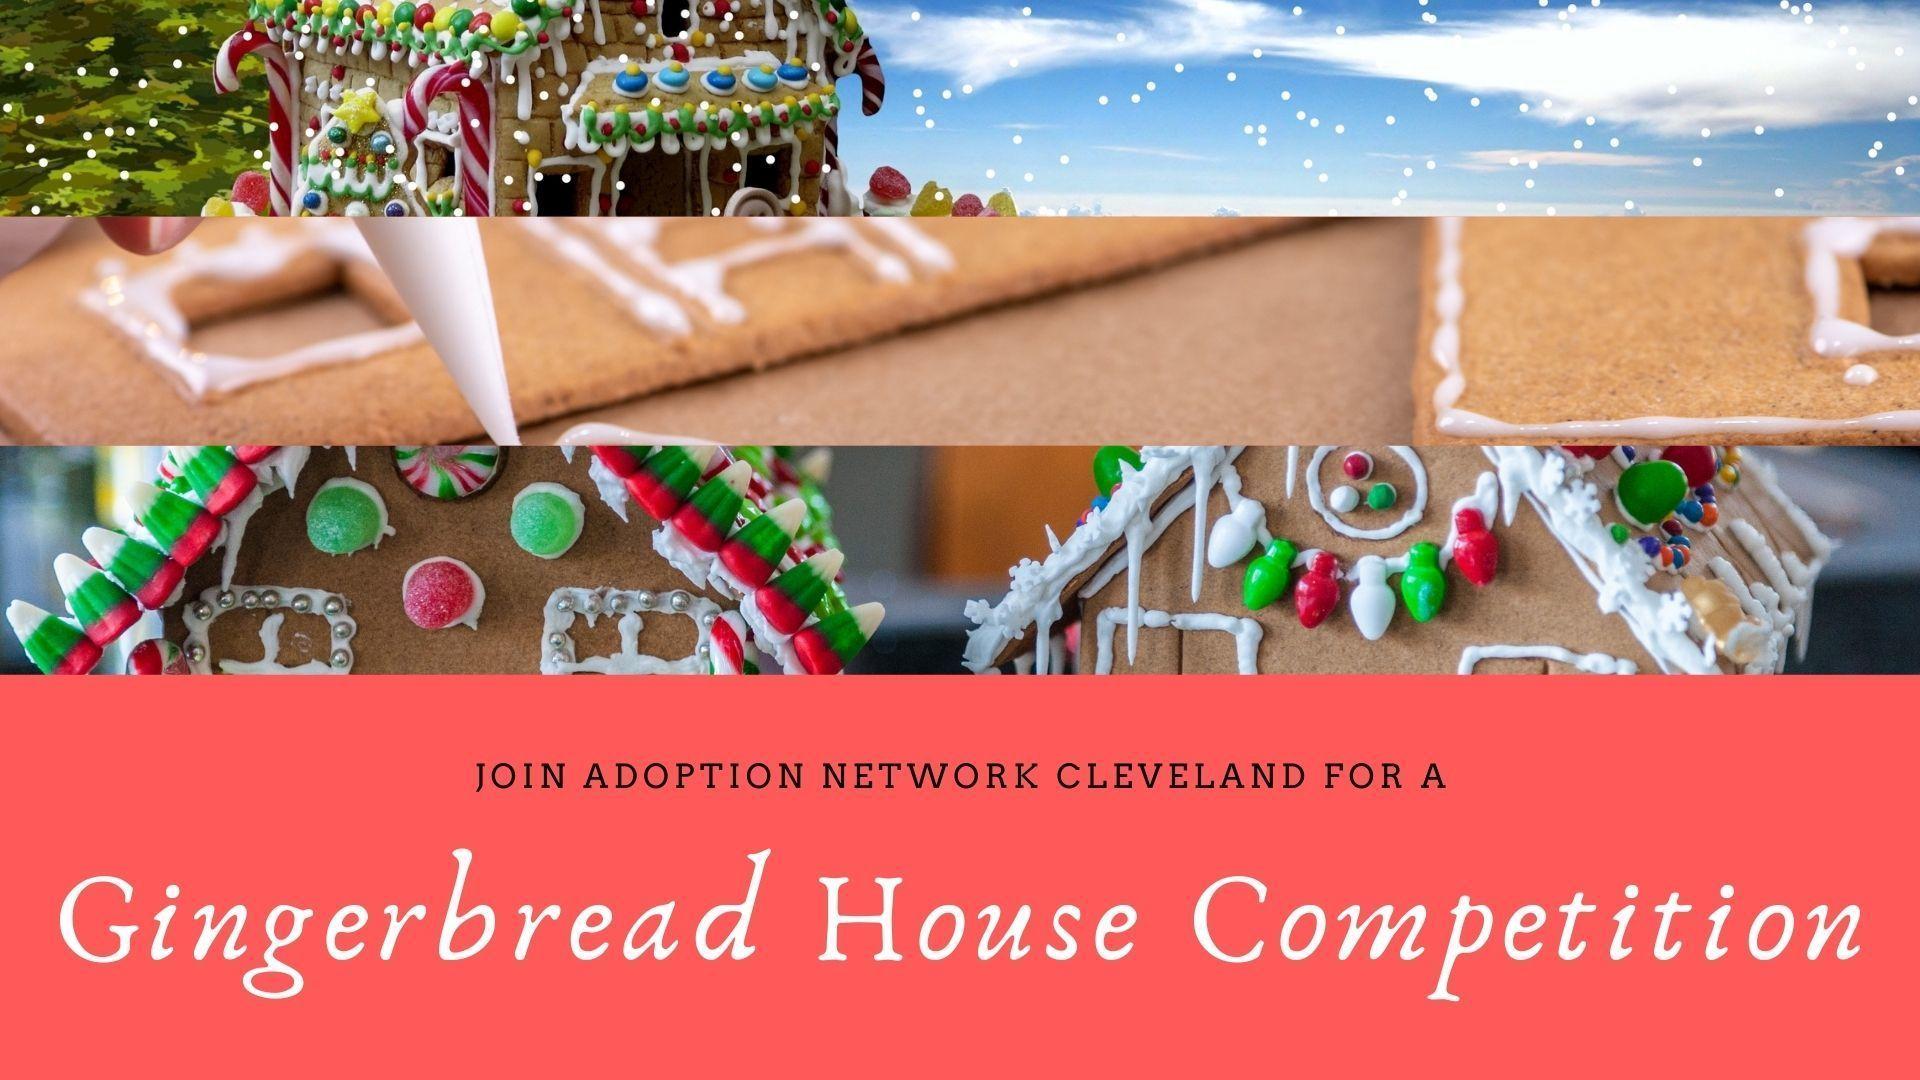 Gingerbread House Registration Deadline